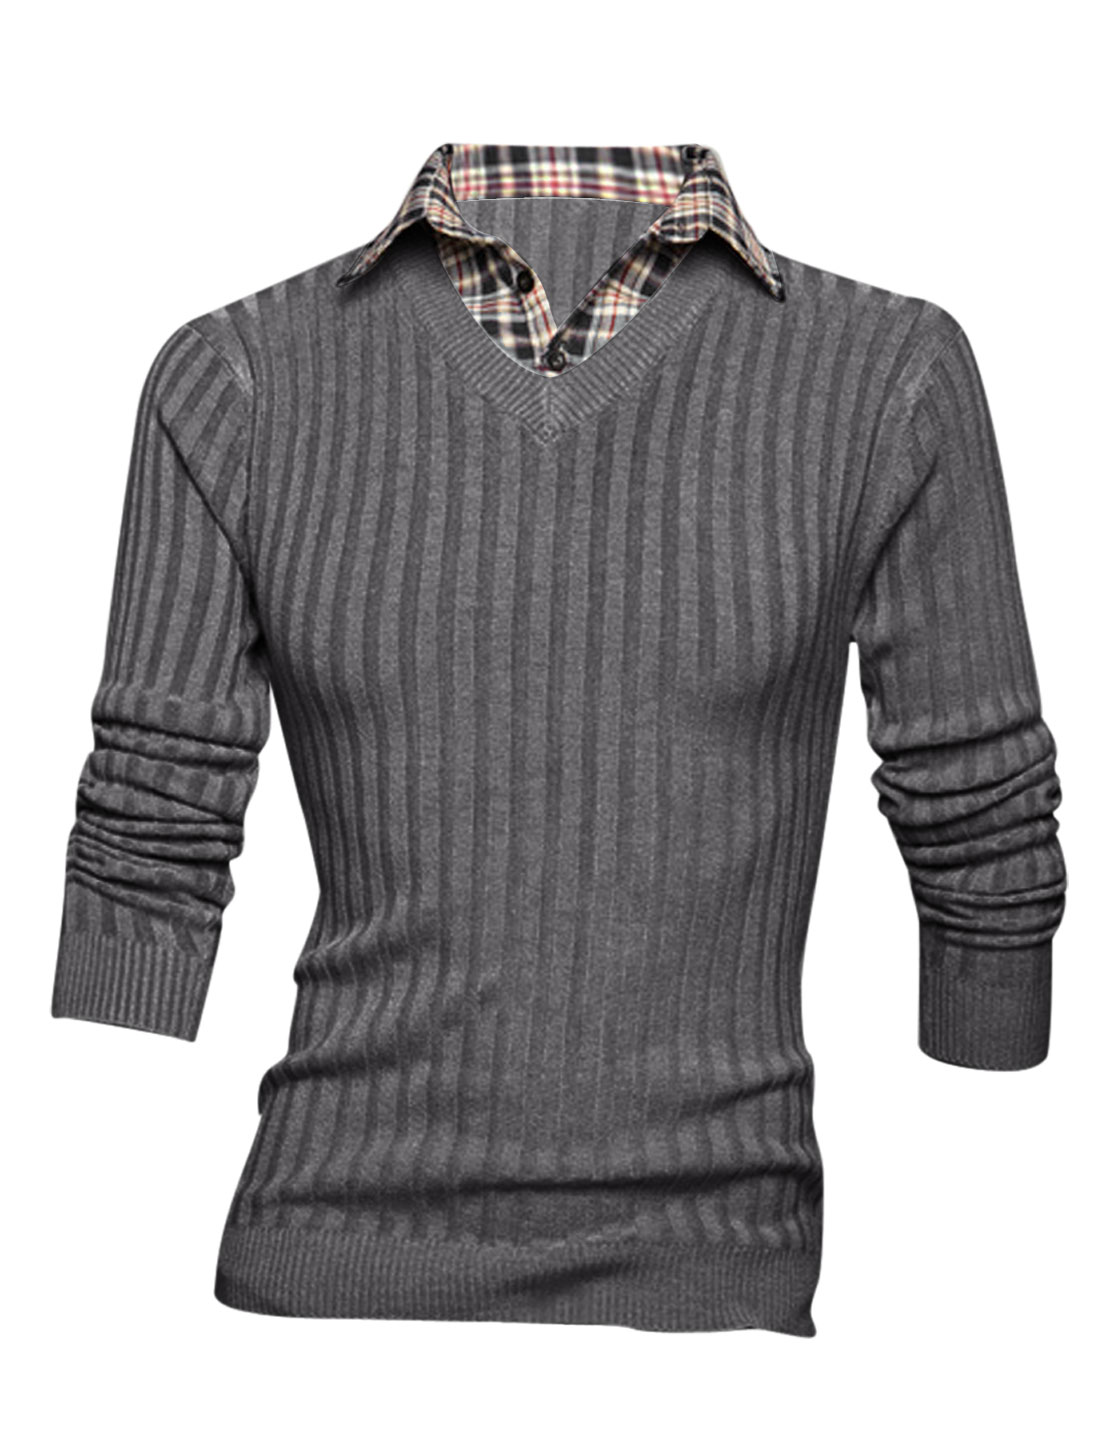 Men Layered Designs Plaids Stitched Design Slim Fit Knit Shirt Dark Gray M